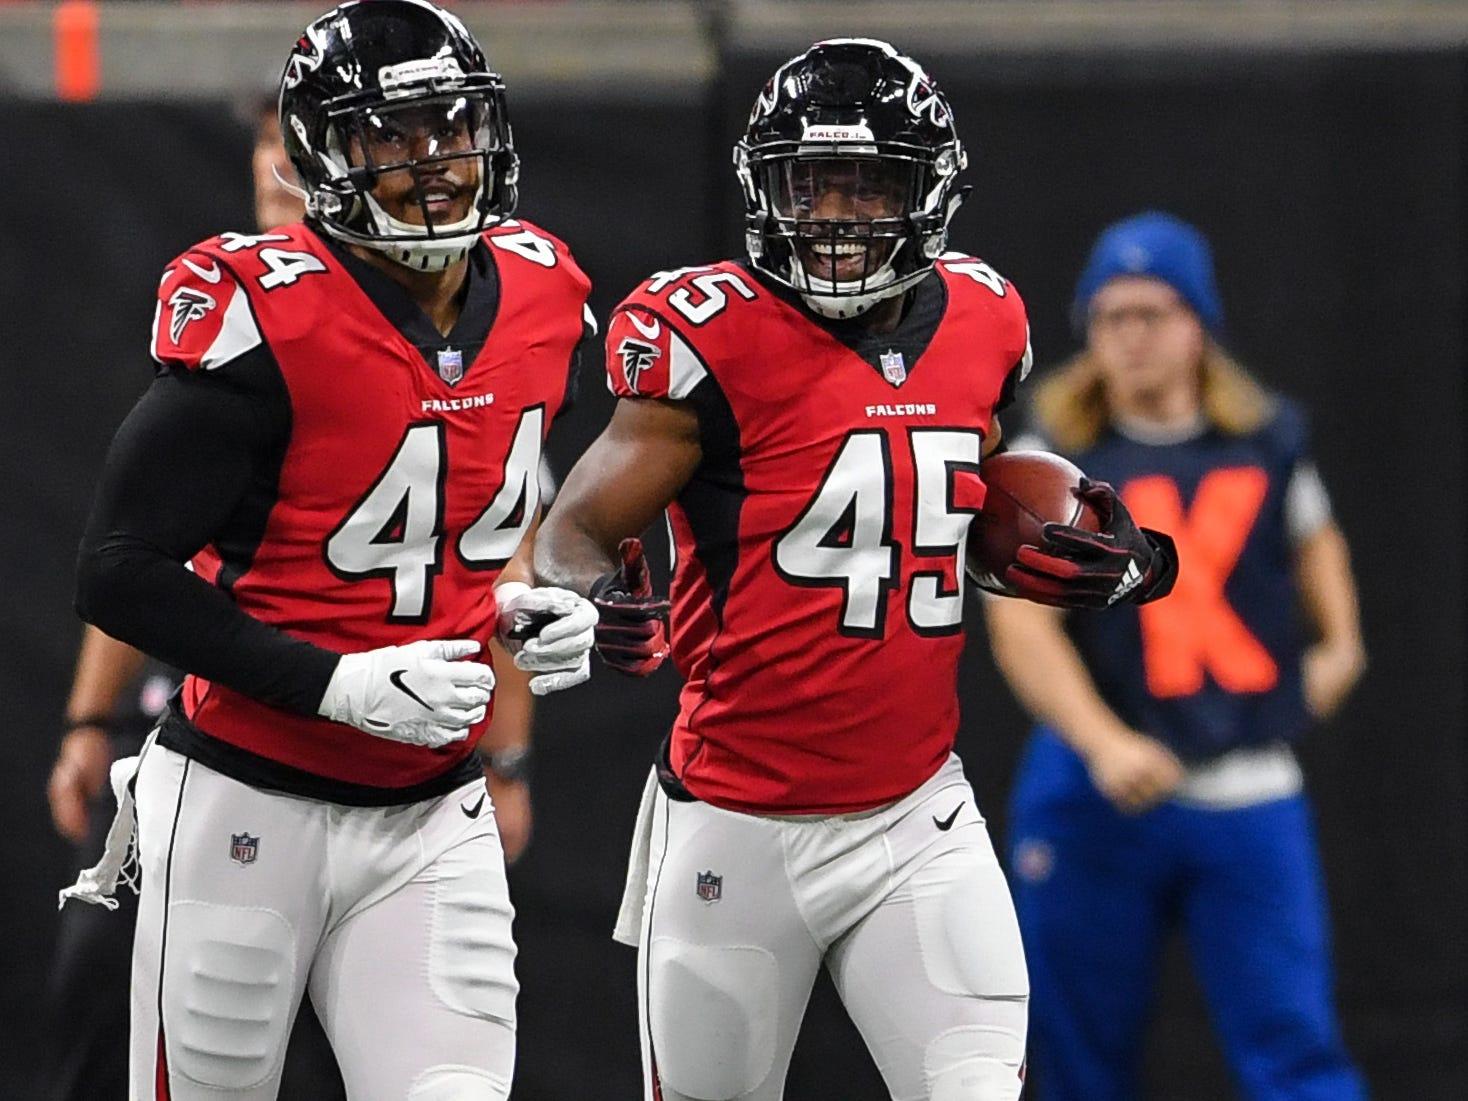 Falcons linebacker Deion Jones (45) reacts after returning an interception for a touchdown against the Cardinals.